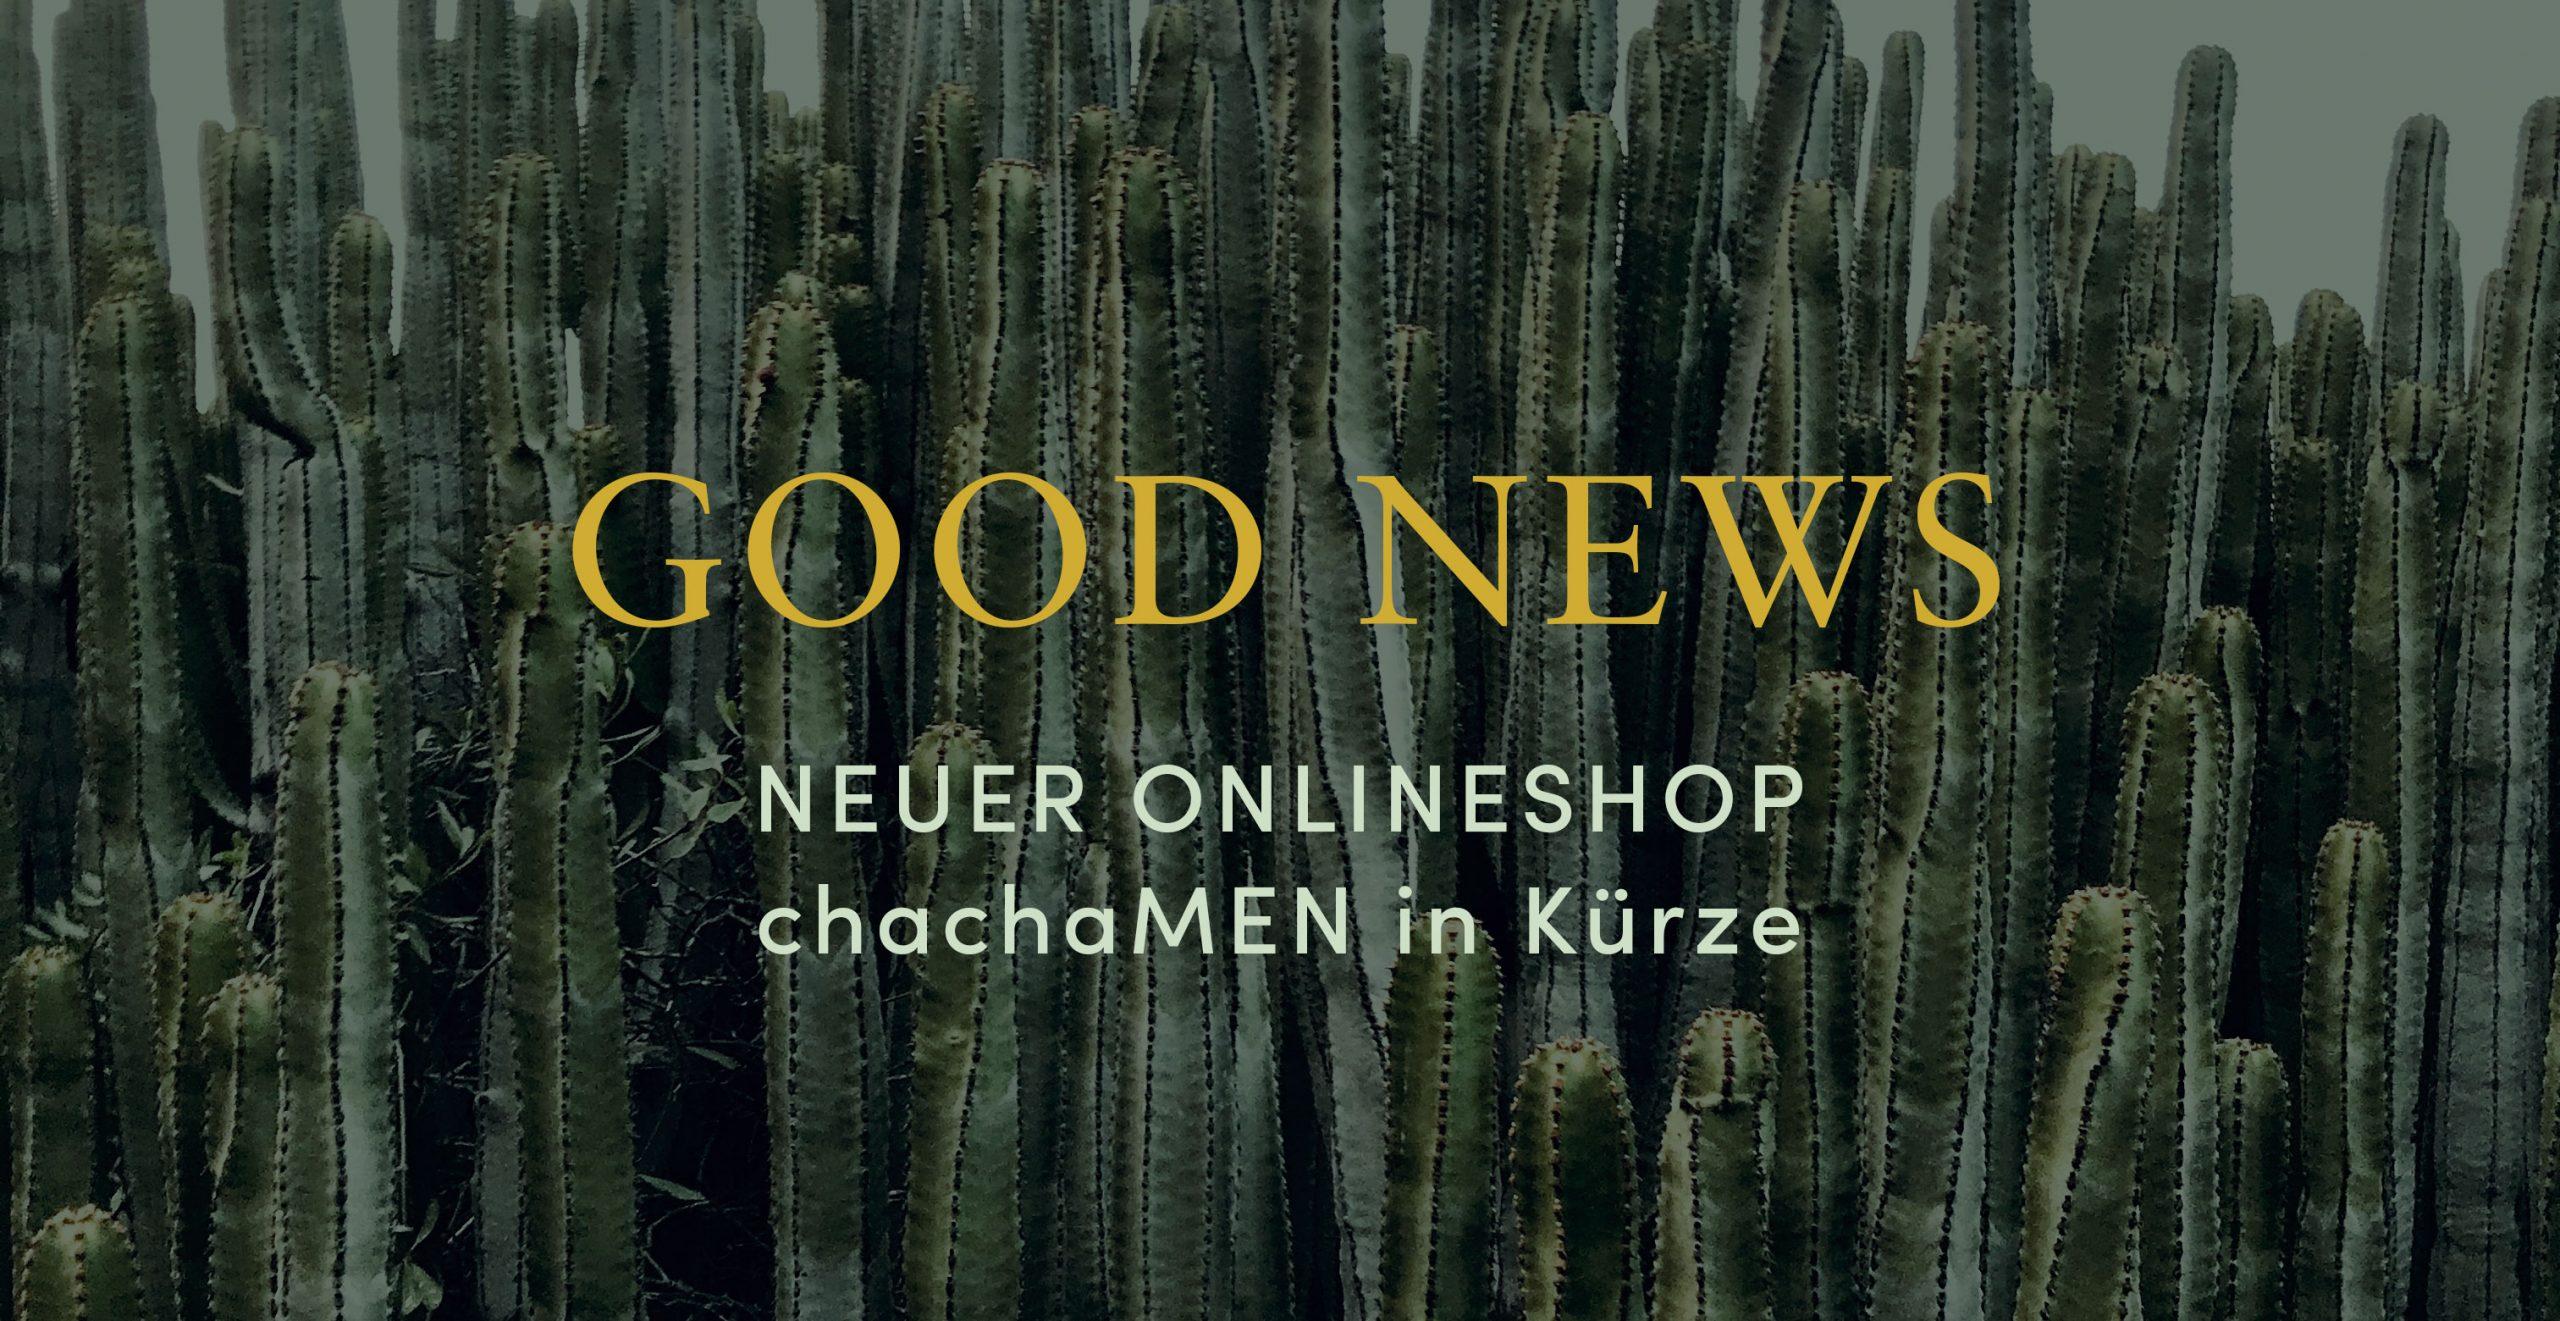 GoodNews-Onlineshop